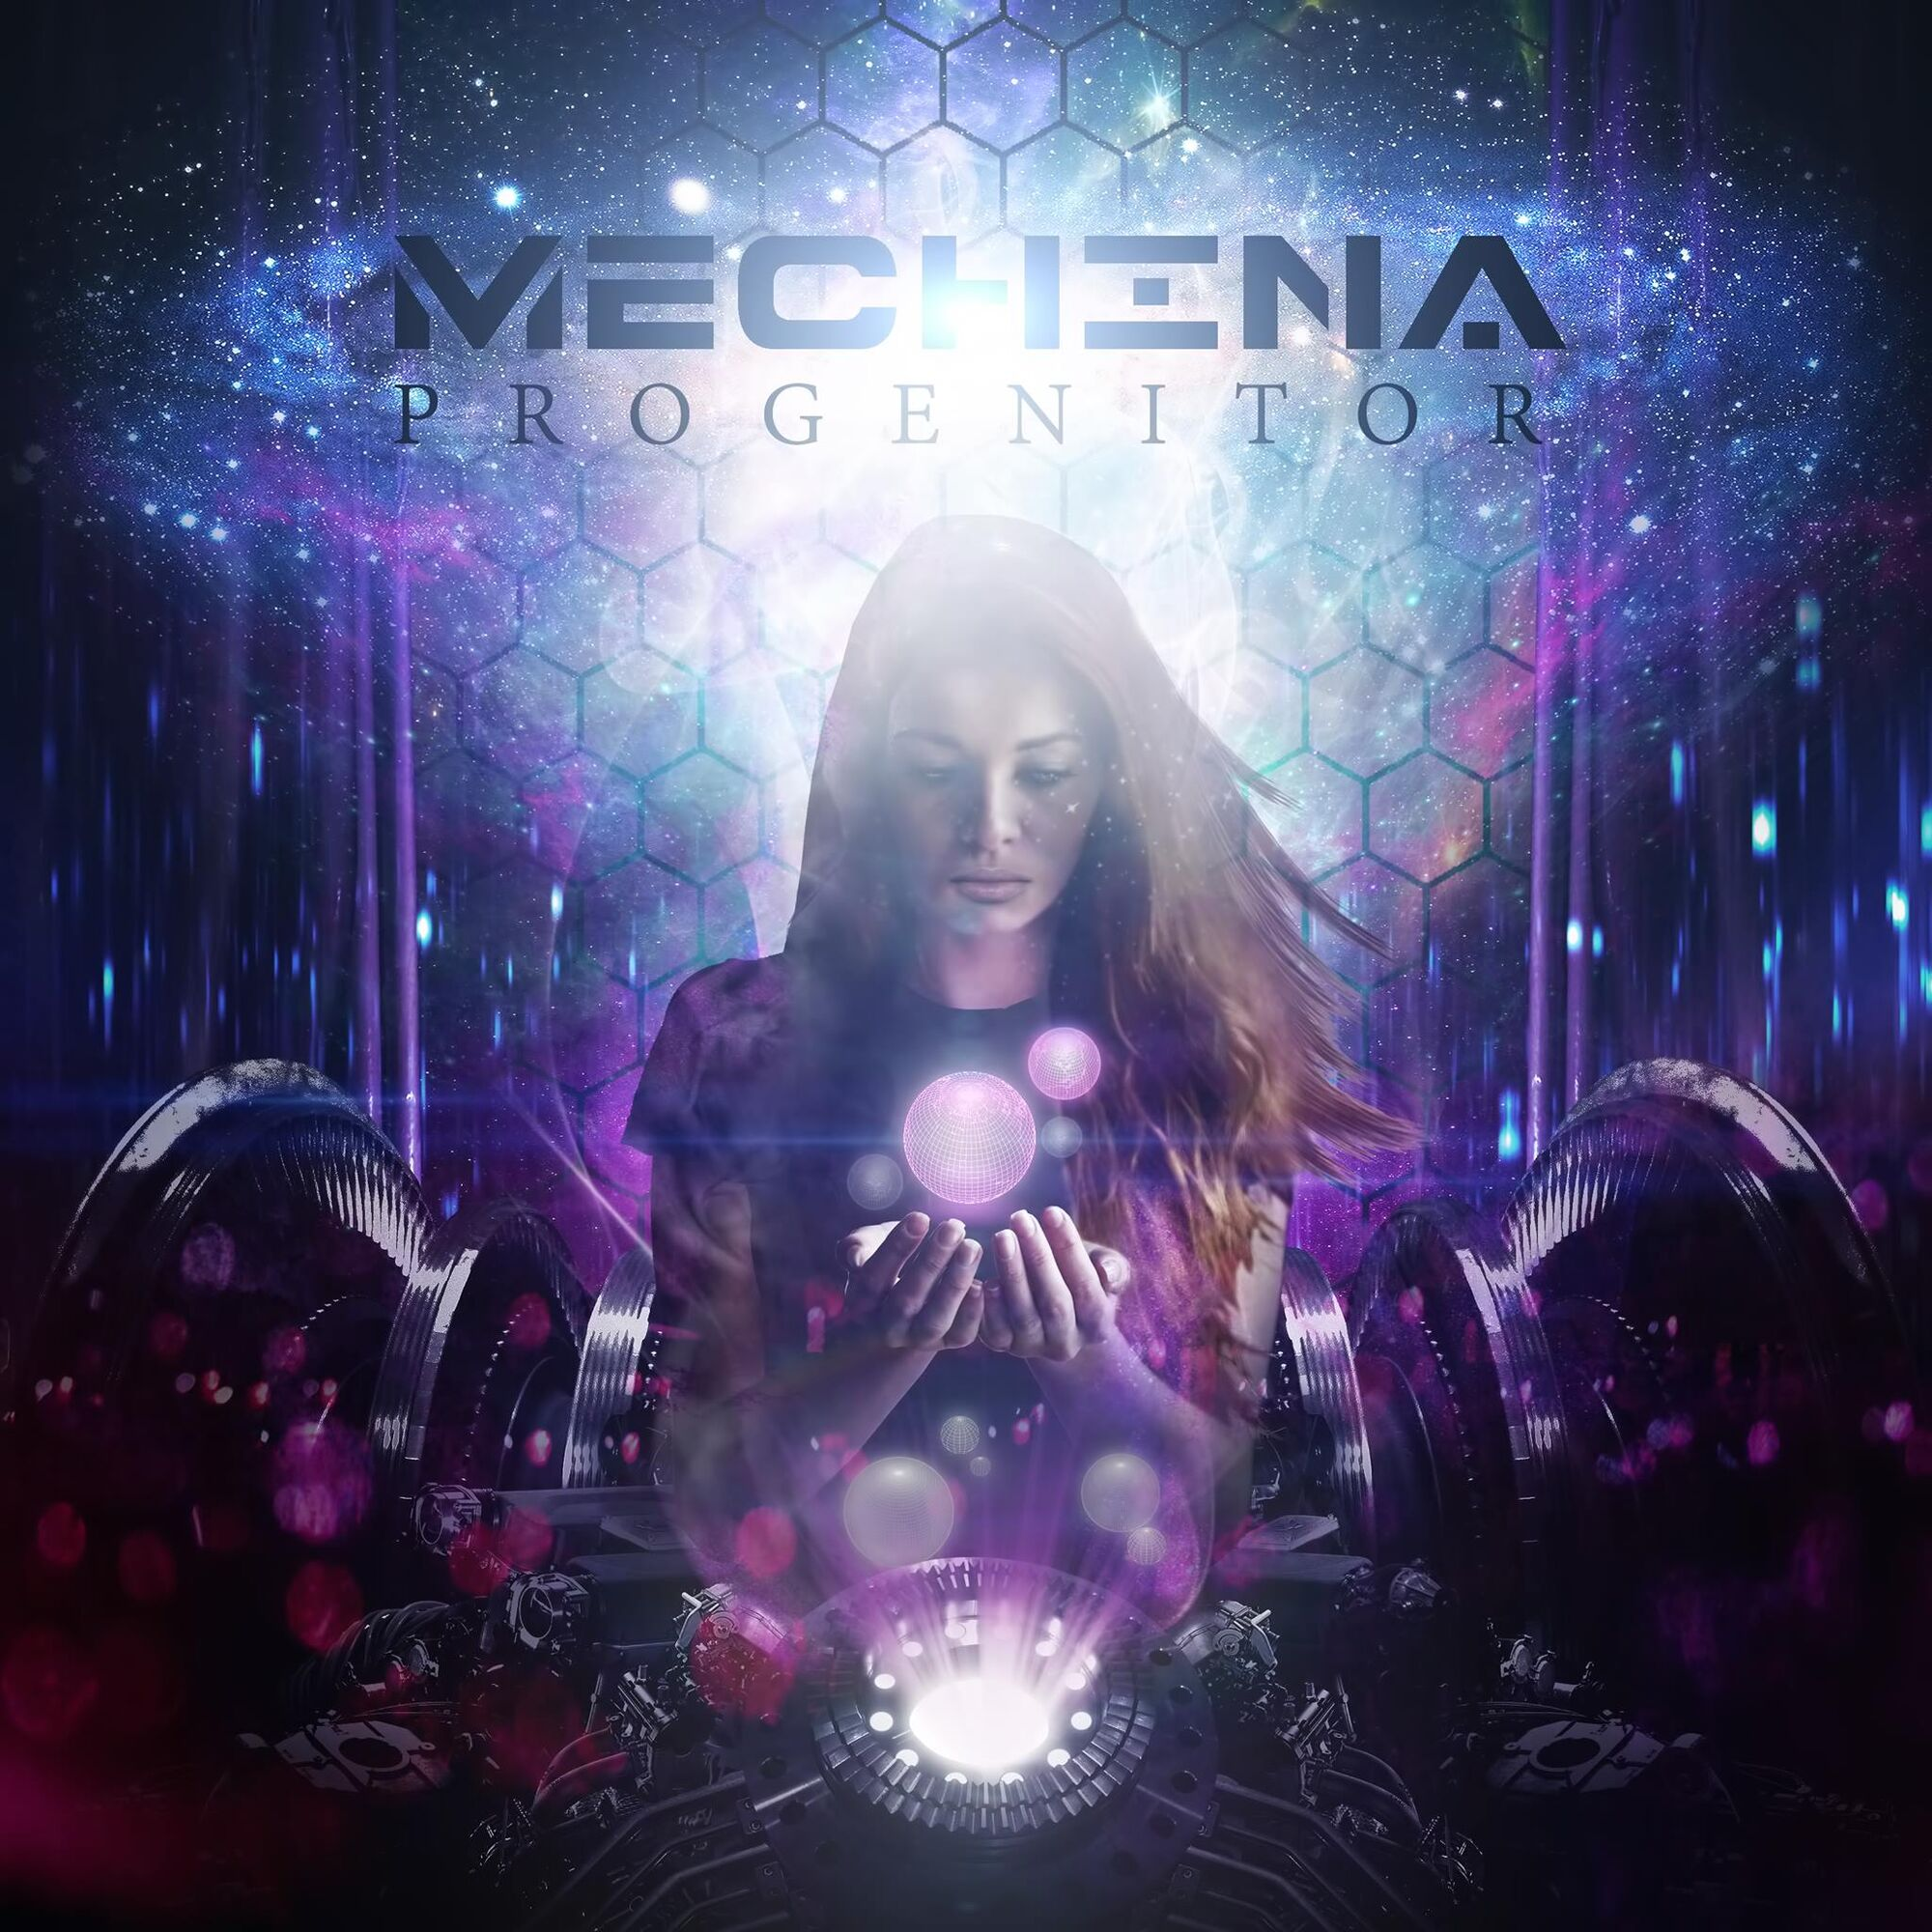 Progenitor Album The Mechina Wiki Fandom Powered By